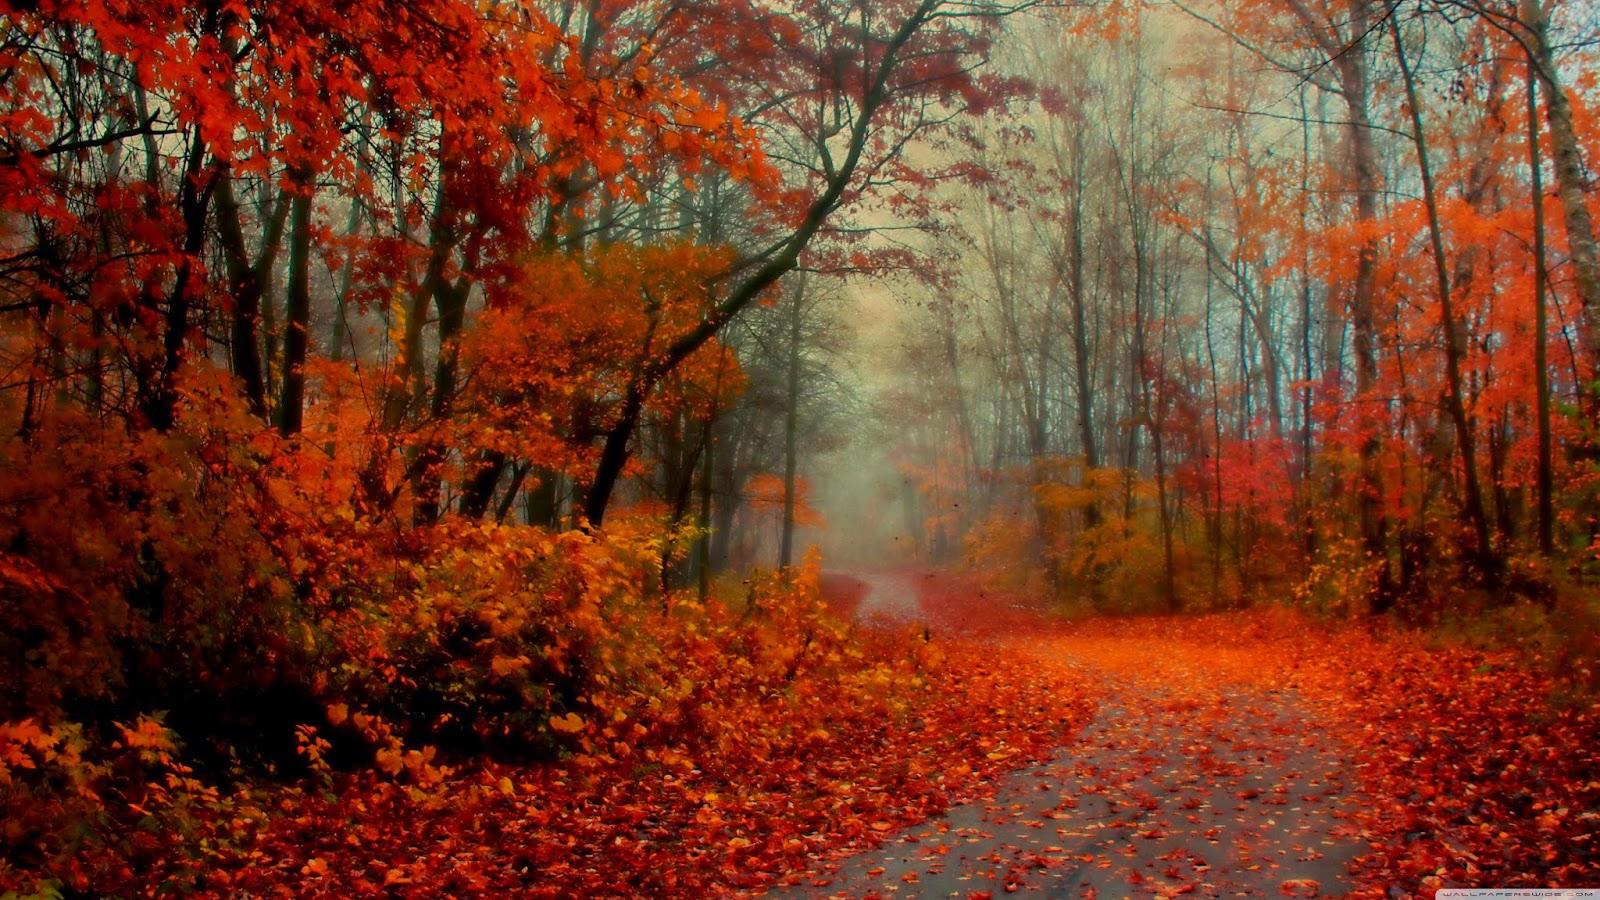 Romantic Autumn Forest Cool Backgrounds